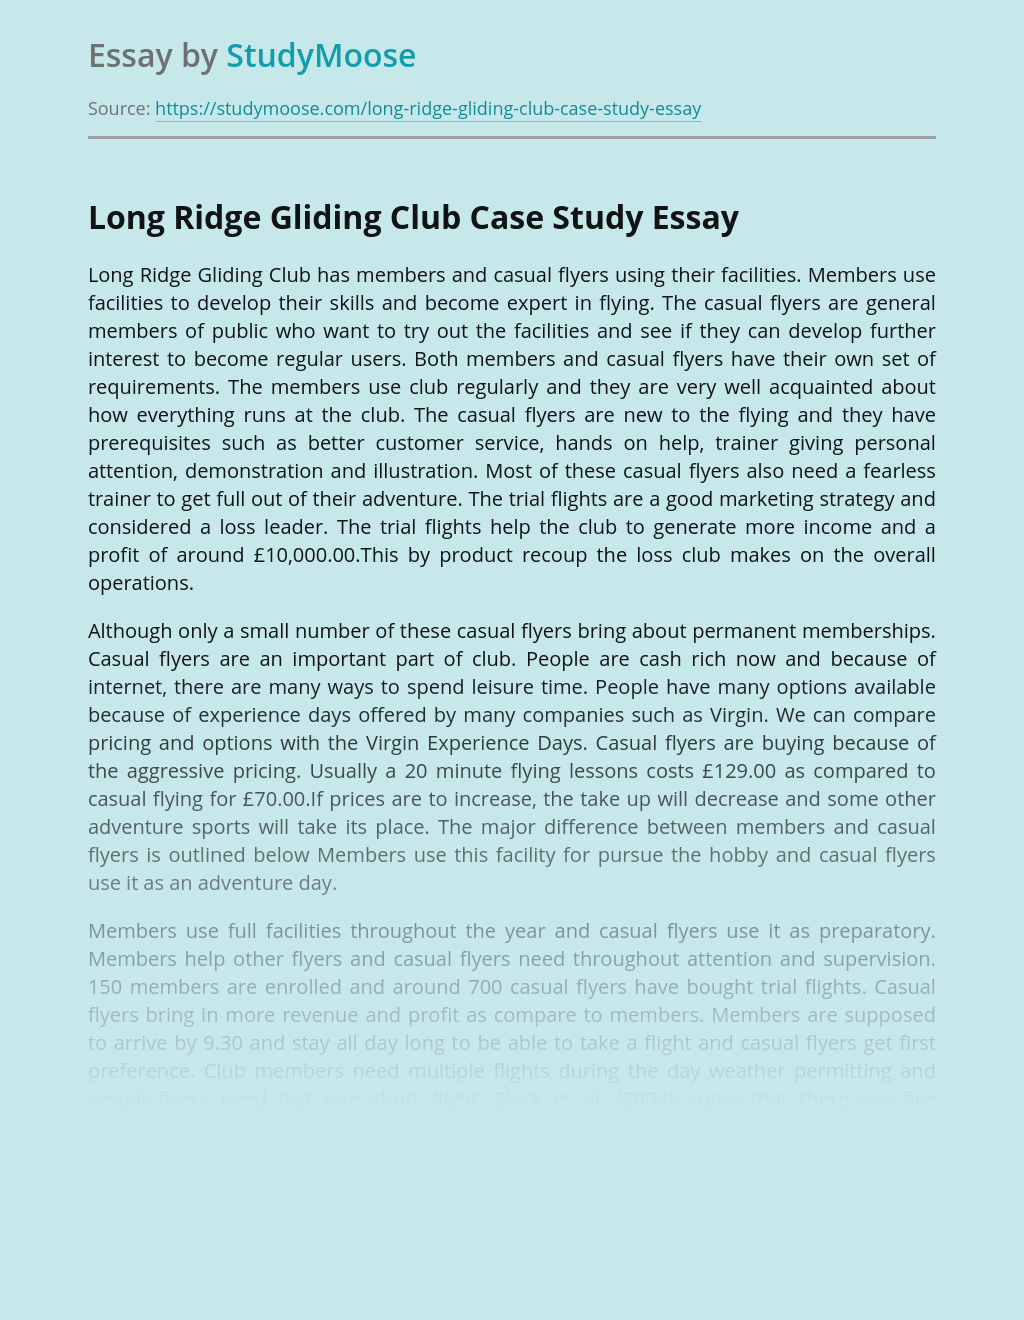 Long Ridge Gliding Club Case Study